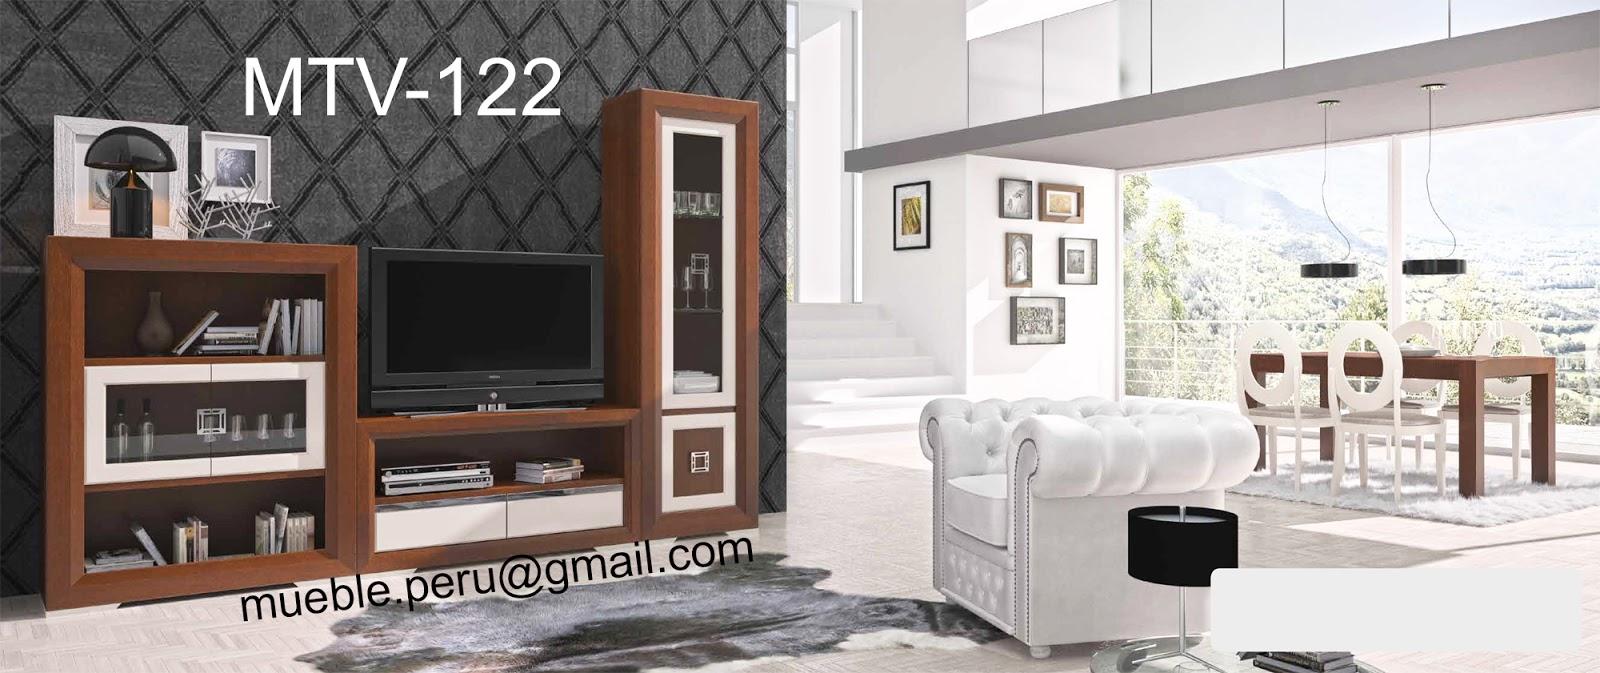 Mueble Per Muebles De Sala Modernos Centros De